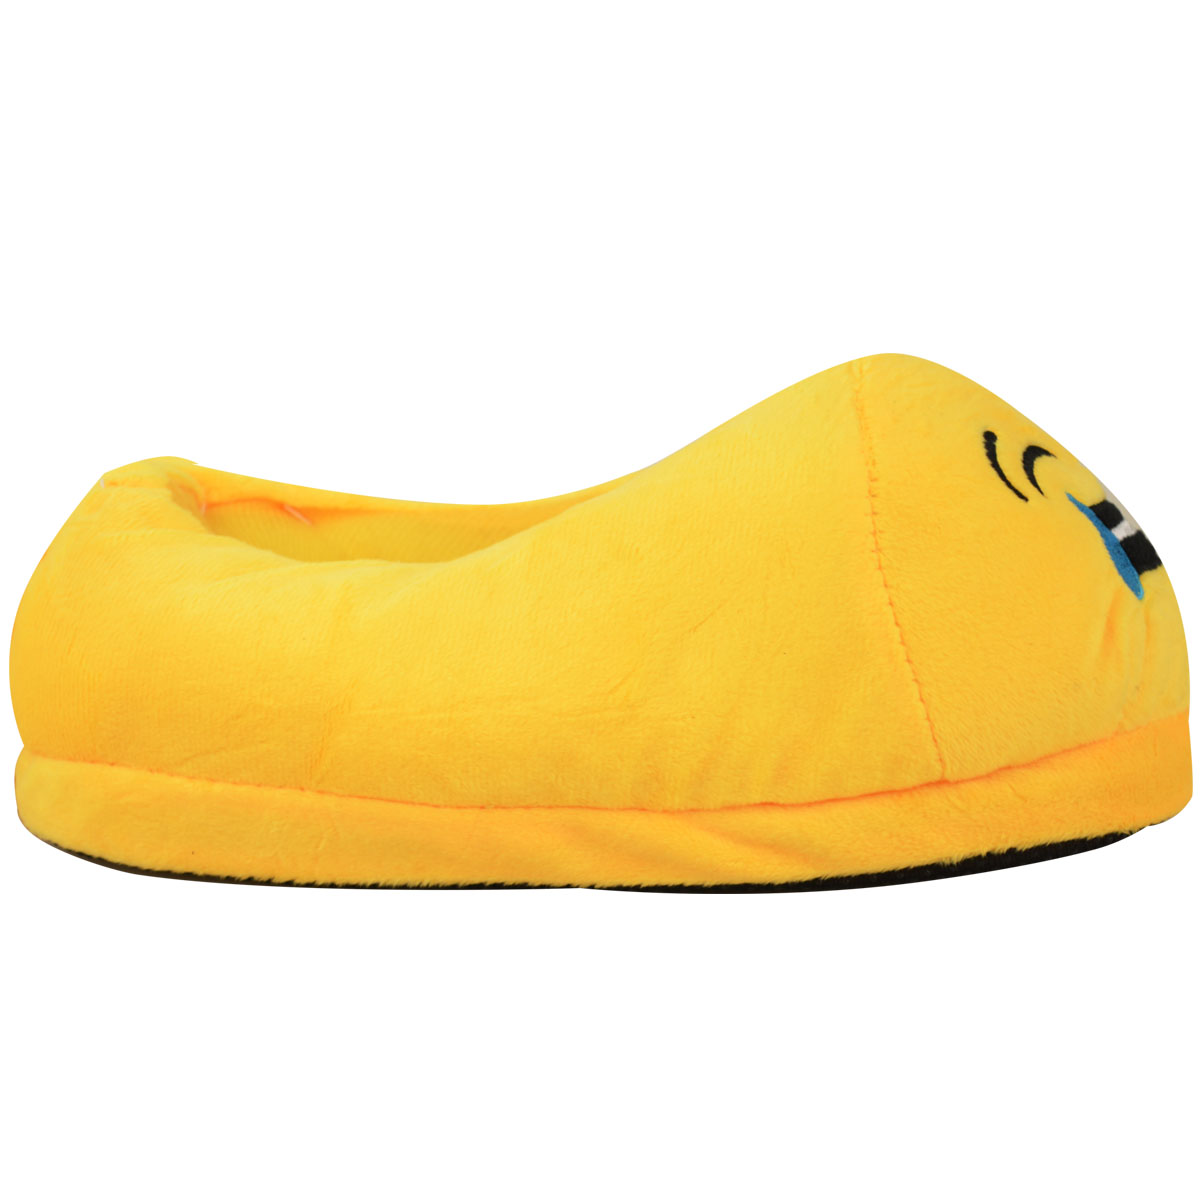 miniatura 9 - Uomini Donne Bambini Emoji Peluche imbottiti unisex Pantofola Inverno Casa Indoor Scarpe Taglia